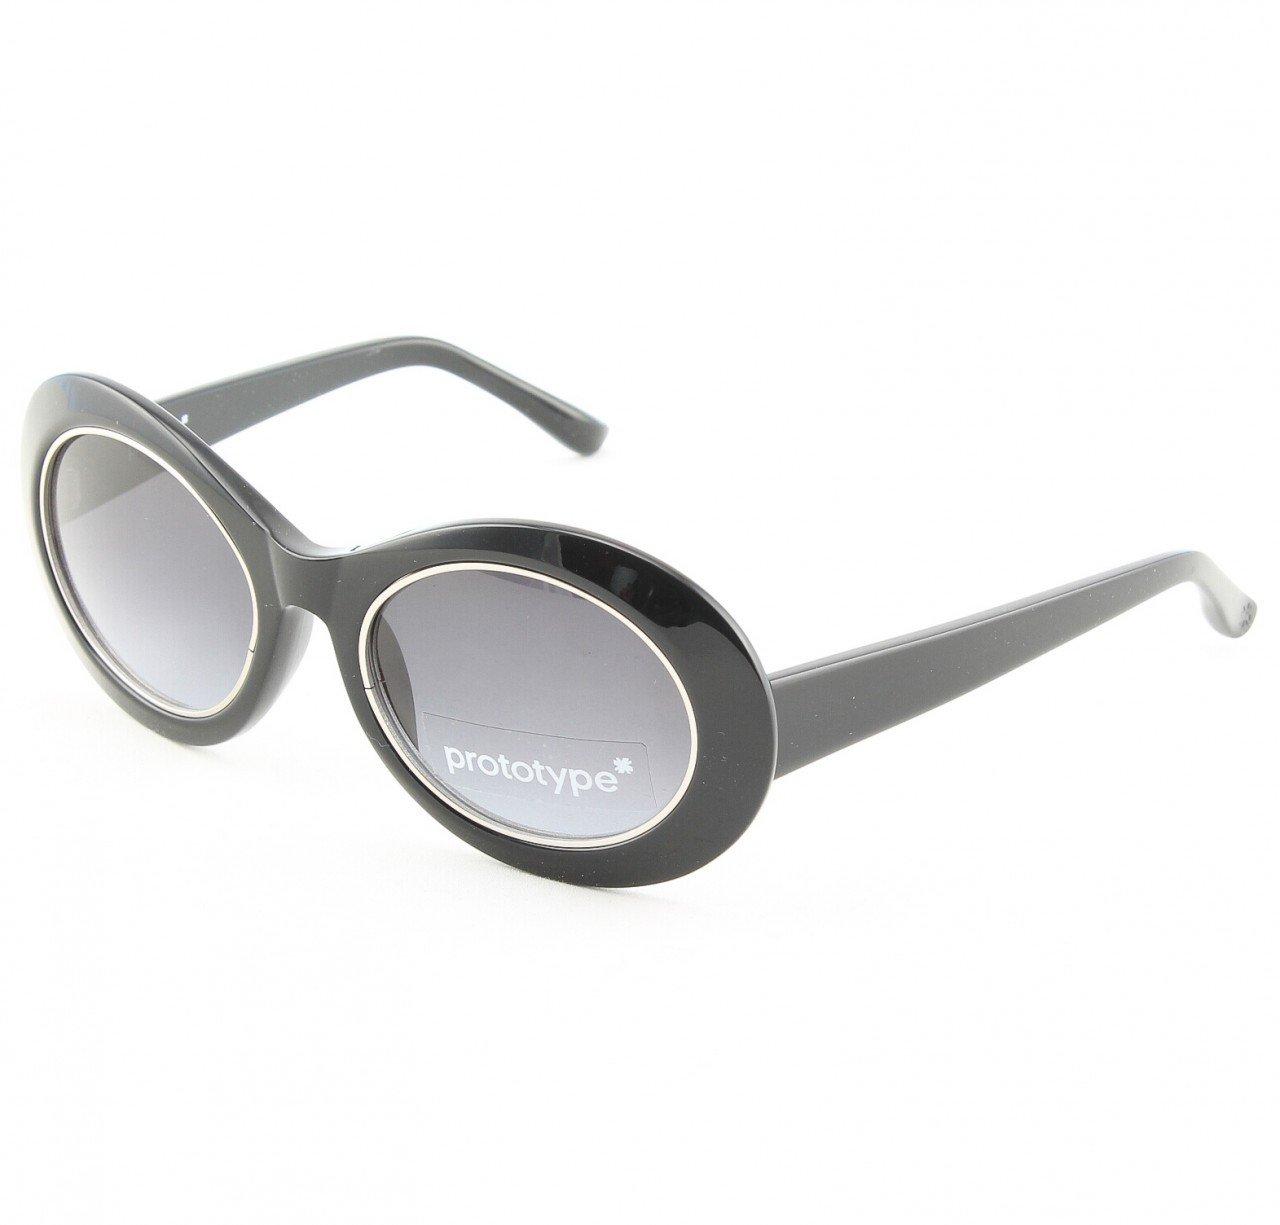 Prototype by Yohji Yamamoto Hornet Sunglasses Col. 01 Black Silver with Grey Gradient Lenses